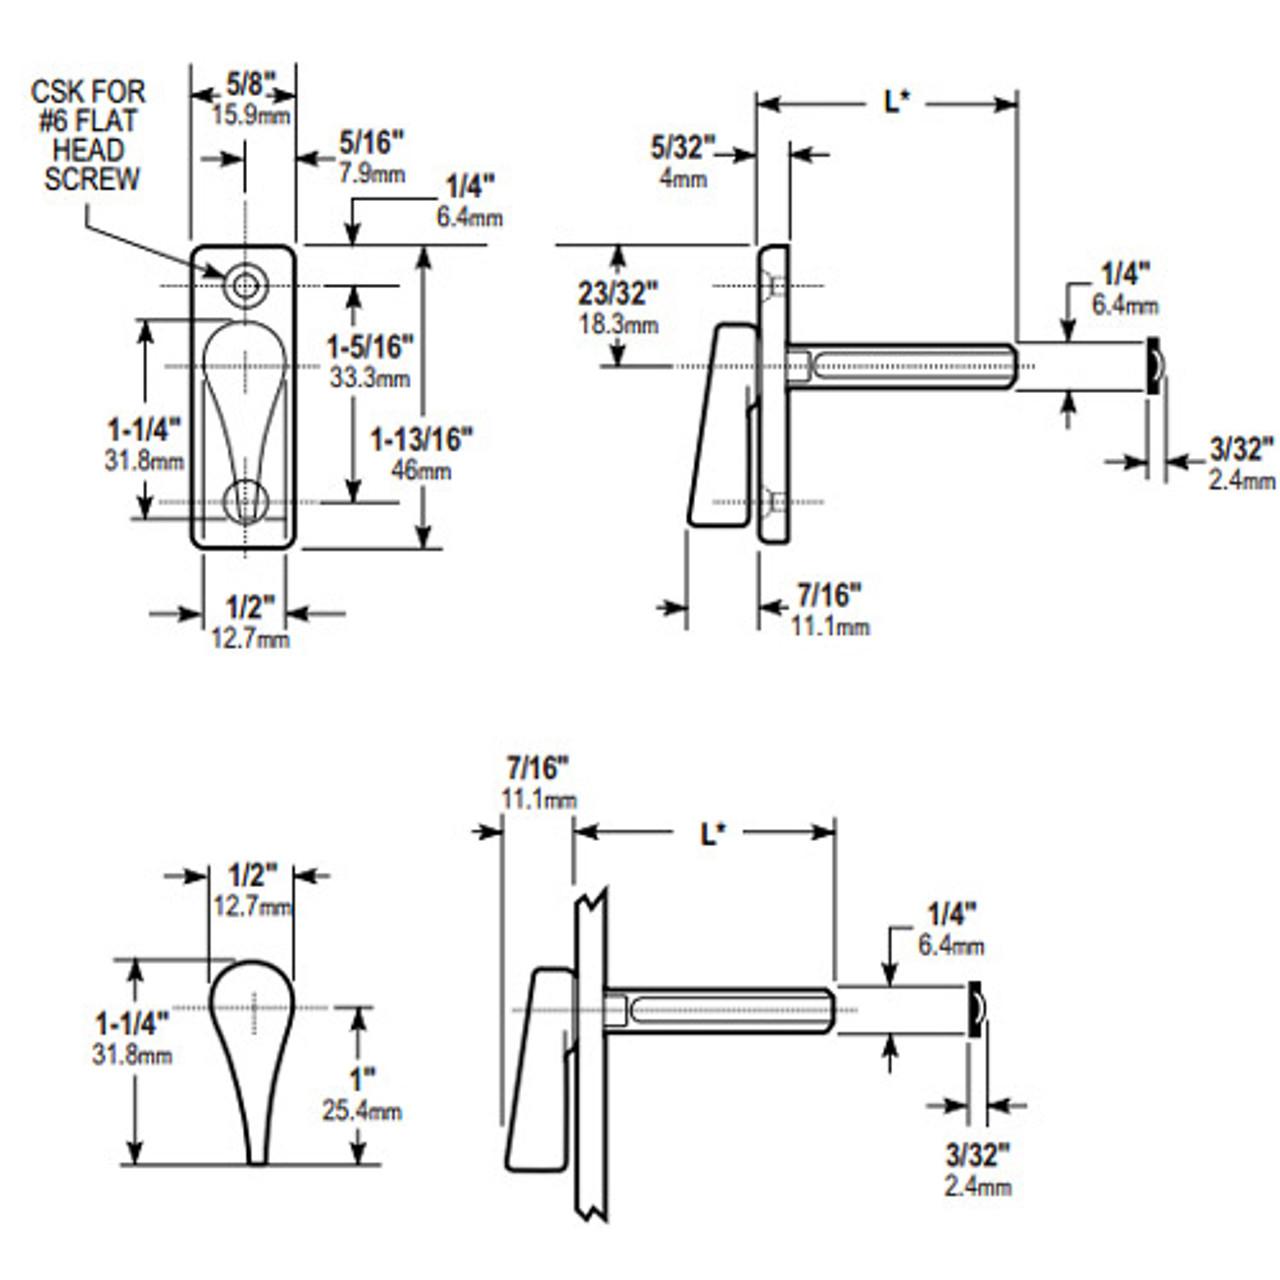 1000-21-17-119 Adams Rite 1000 Series Turns Dimensional View